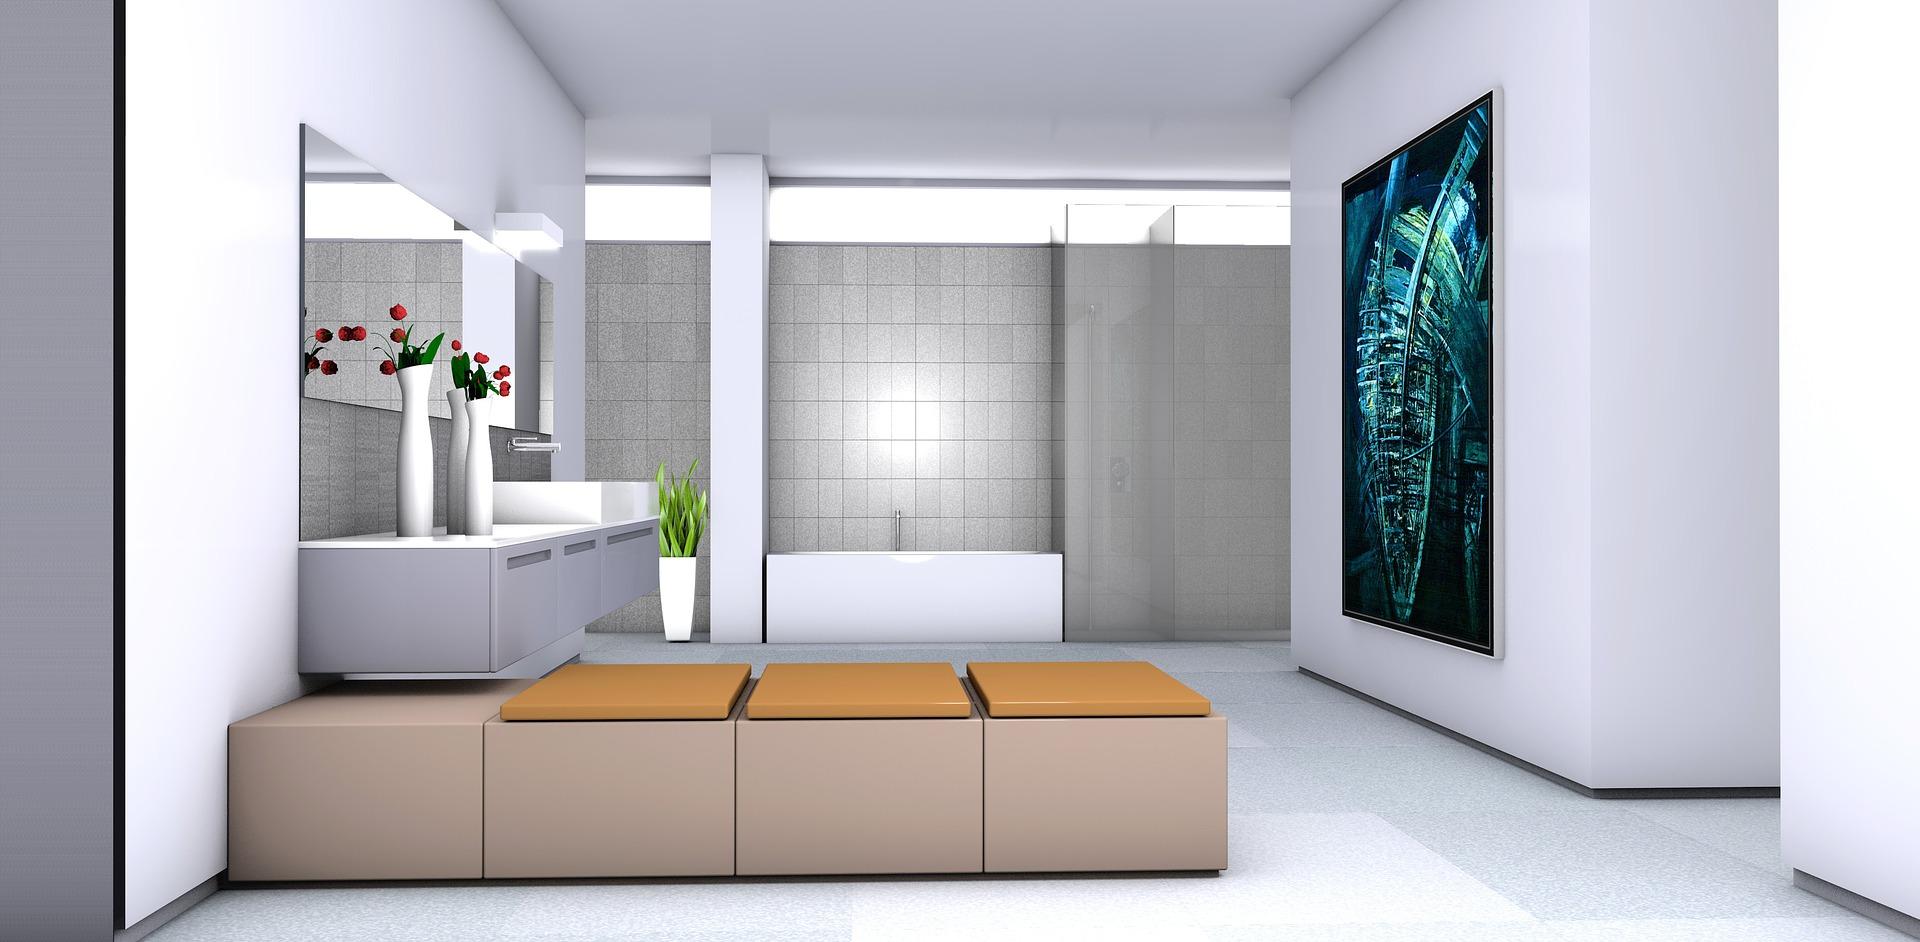 3d badplaner 3d visualisierungen 3d konfigurator 3d agentur 3d renderings 3d animationen. Black Bedroom Furniture Sets. Home Design Ideas